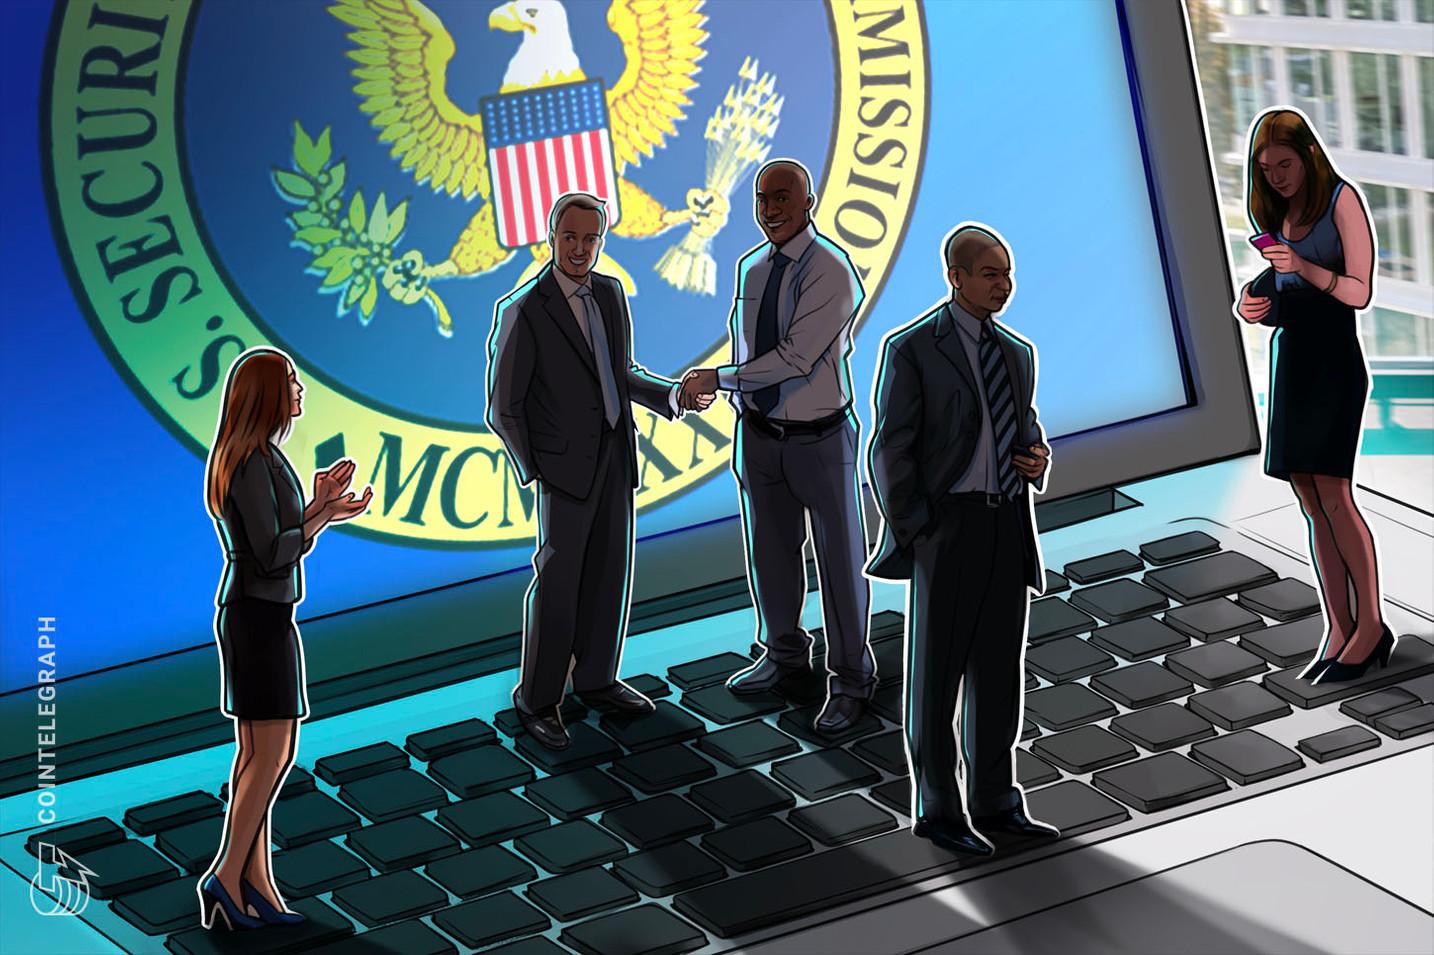 Senadora Warren questiona presidente da SEC sobre falta de proteção ao investidor de criptomoedas